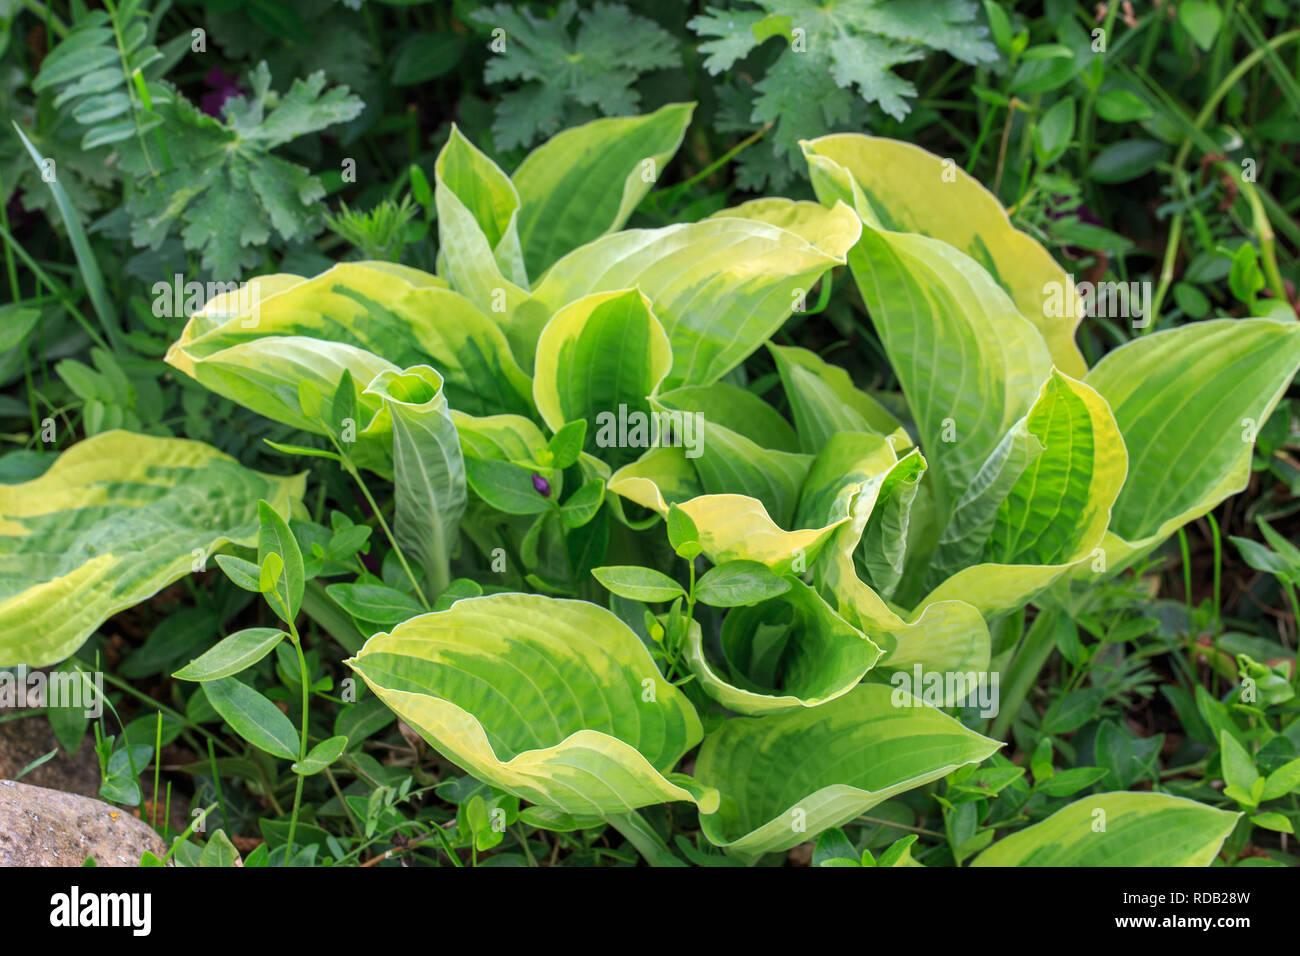 Violette Blumen blühende hosta Hosta undulata Stockbild